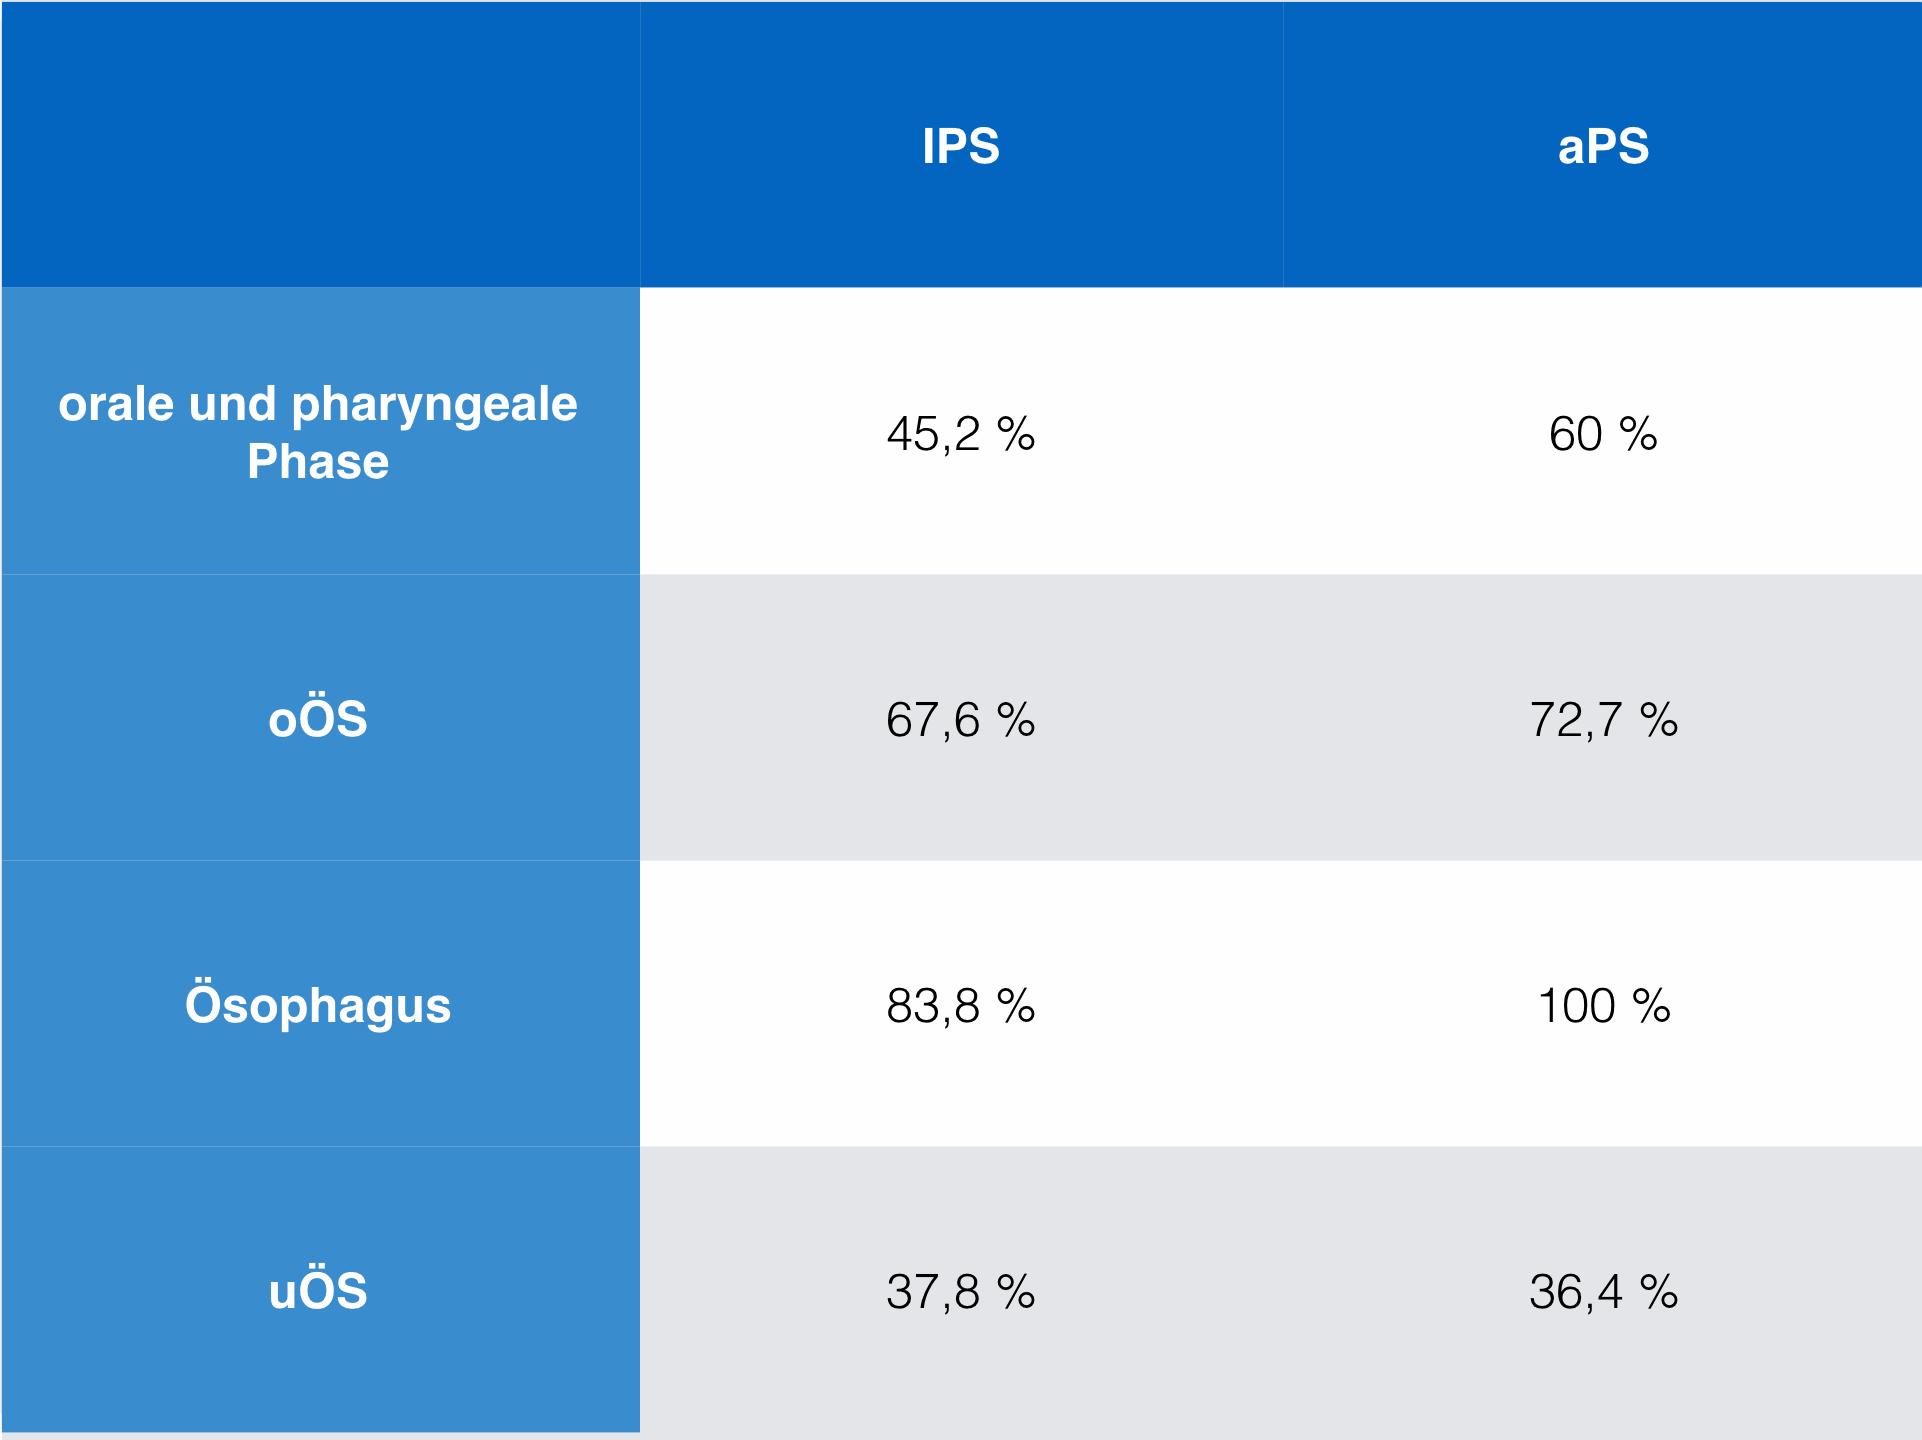 Störungen oÖS bei Parkinson